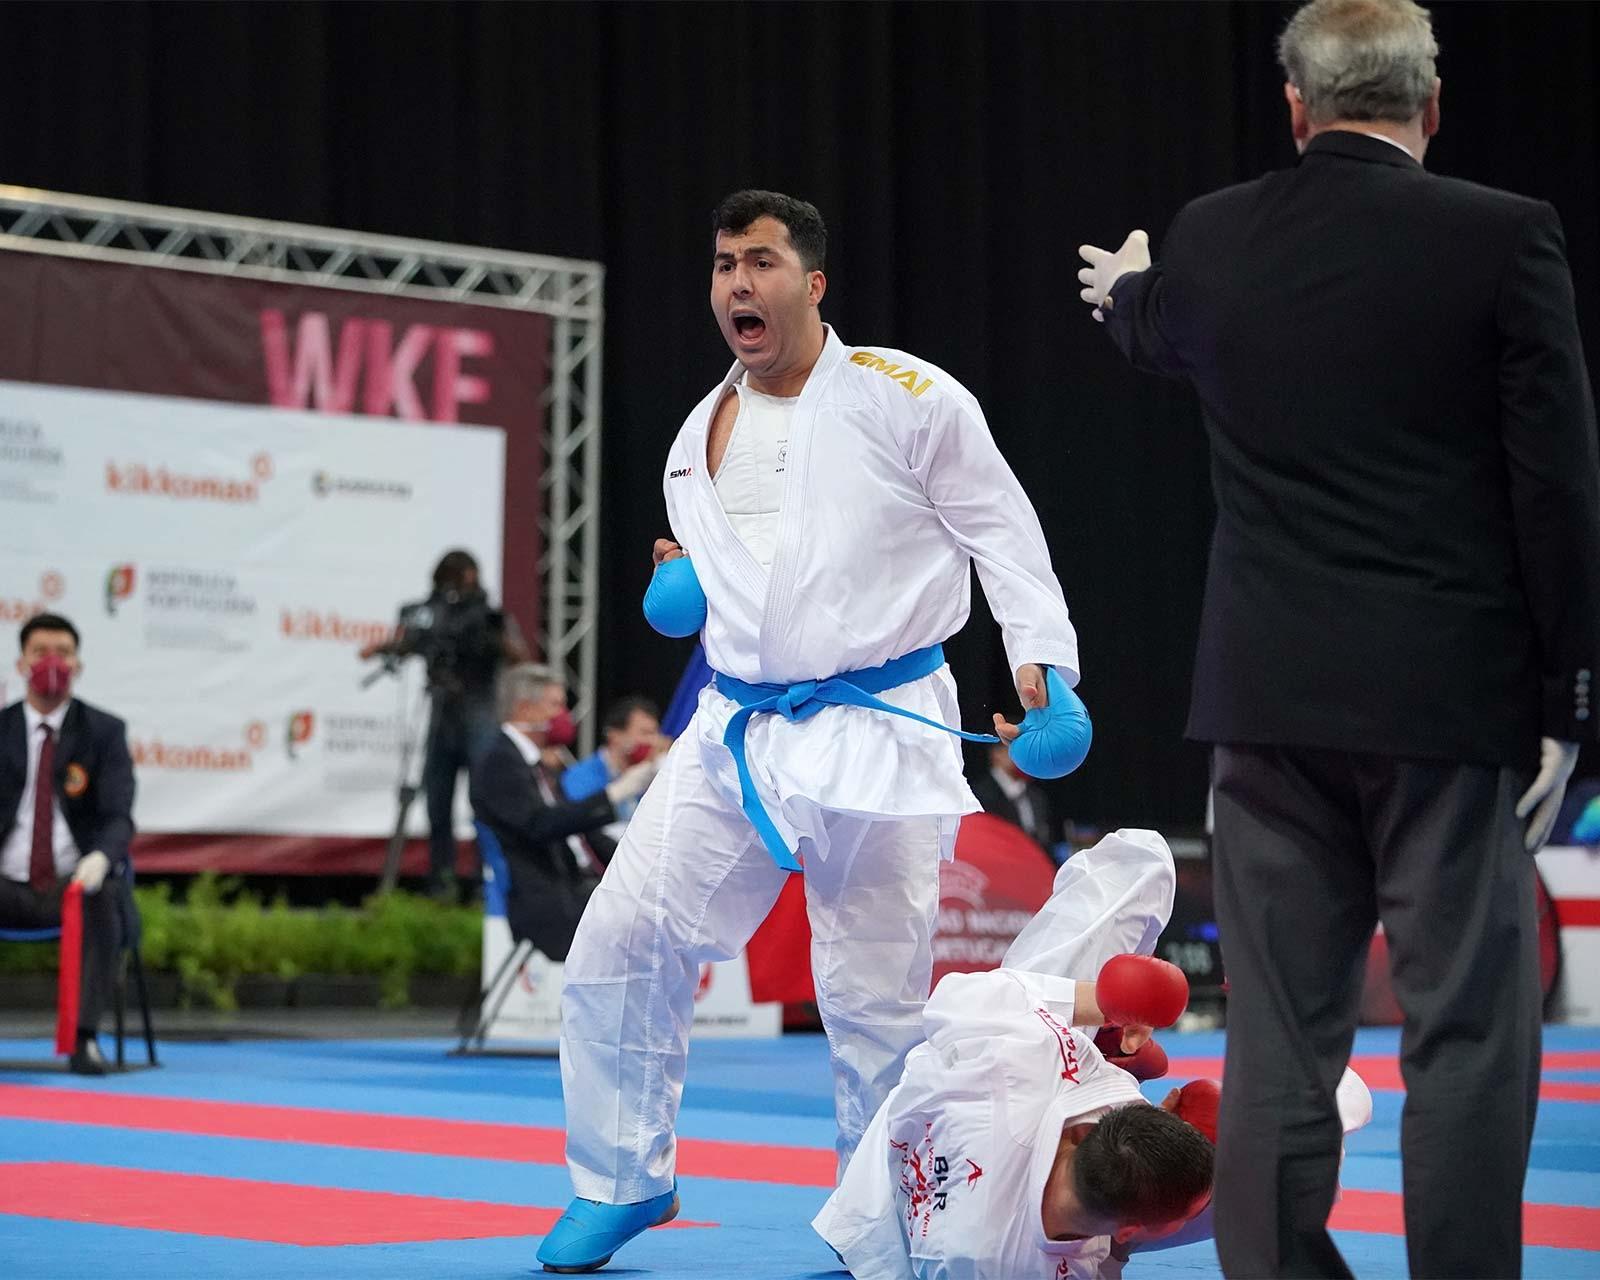 olympic karate athlete celebrates victory